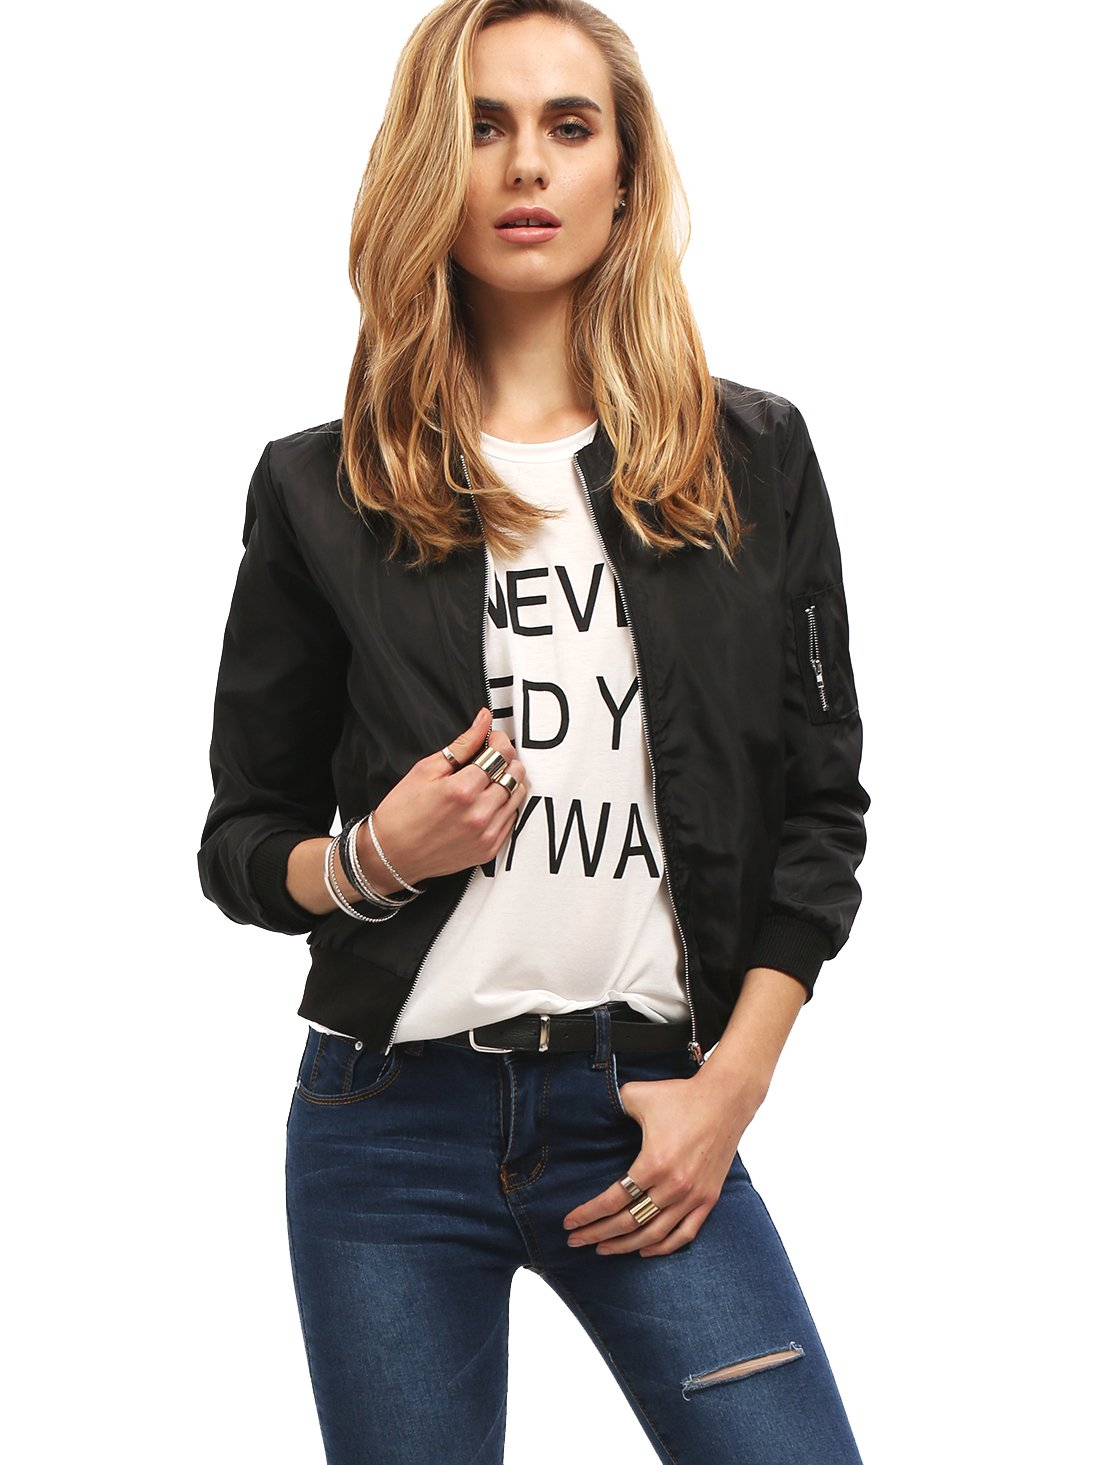 Romwe Women's Classic Zipper Short Bomber Jacket Coat Black S